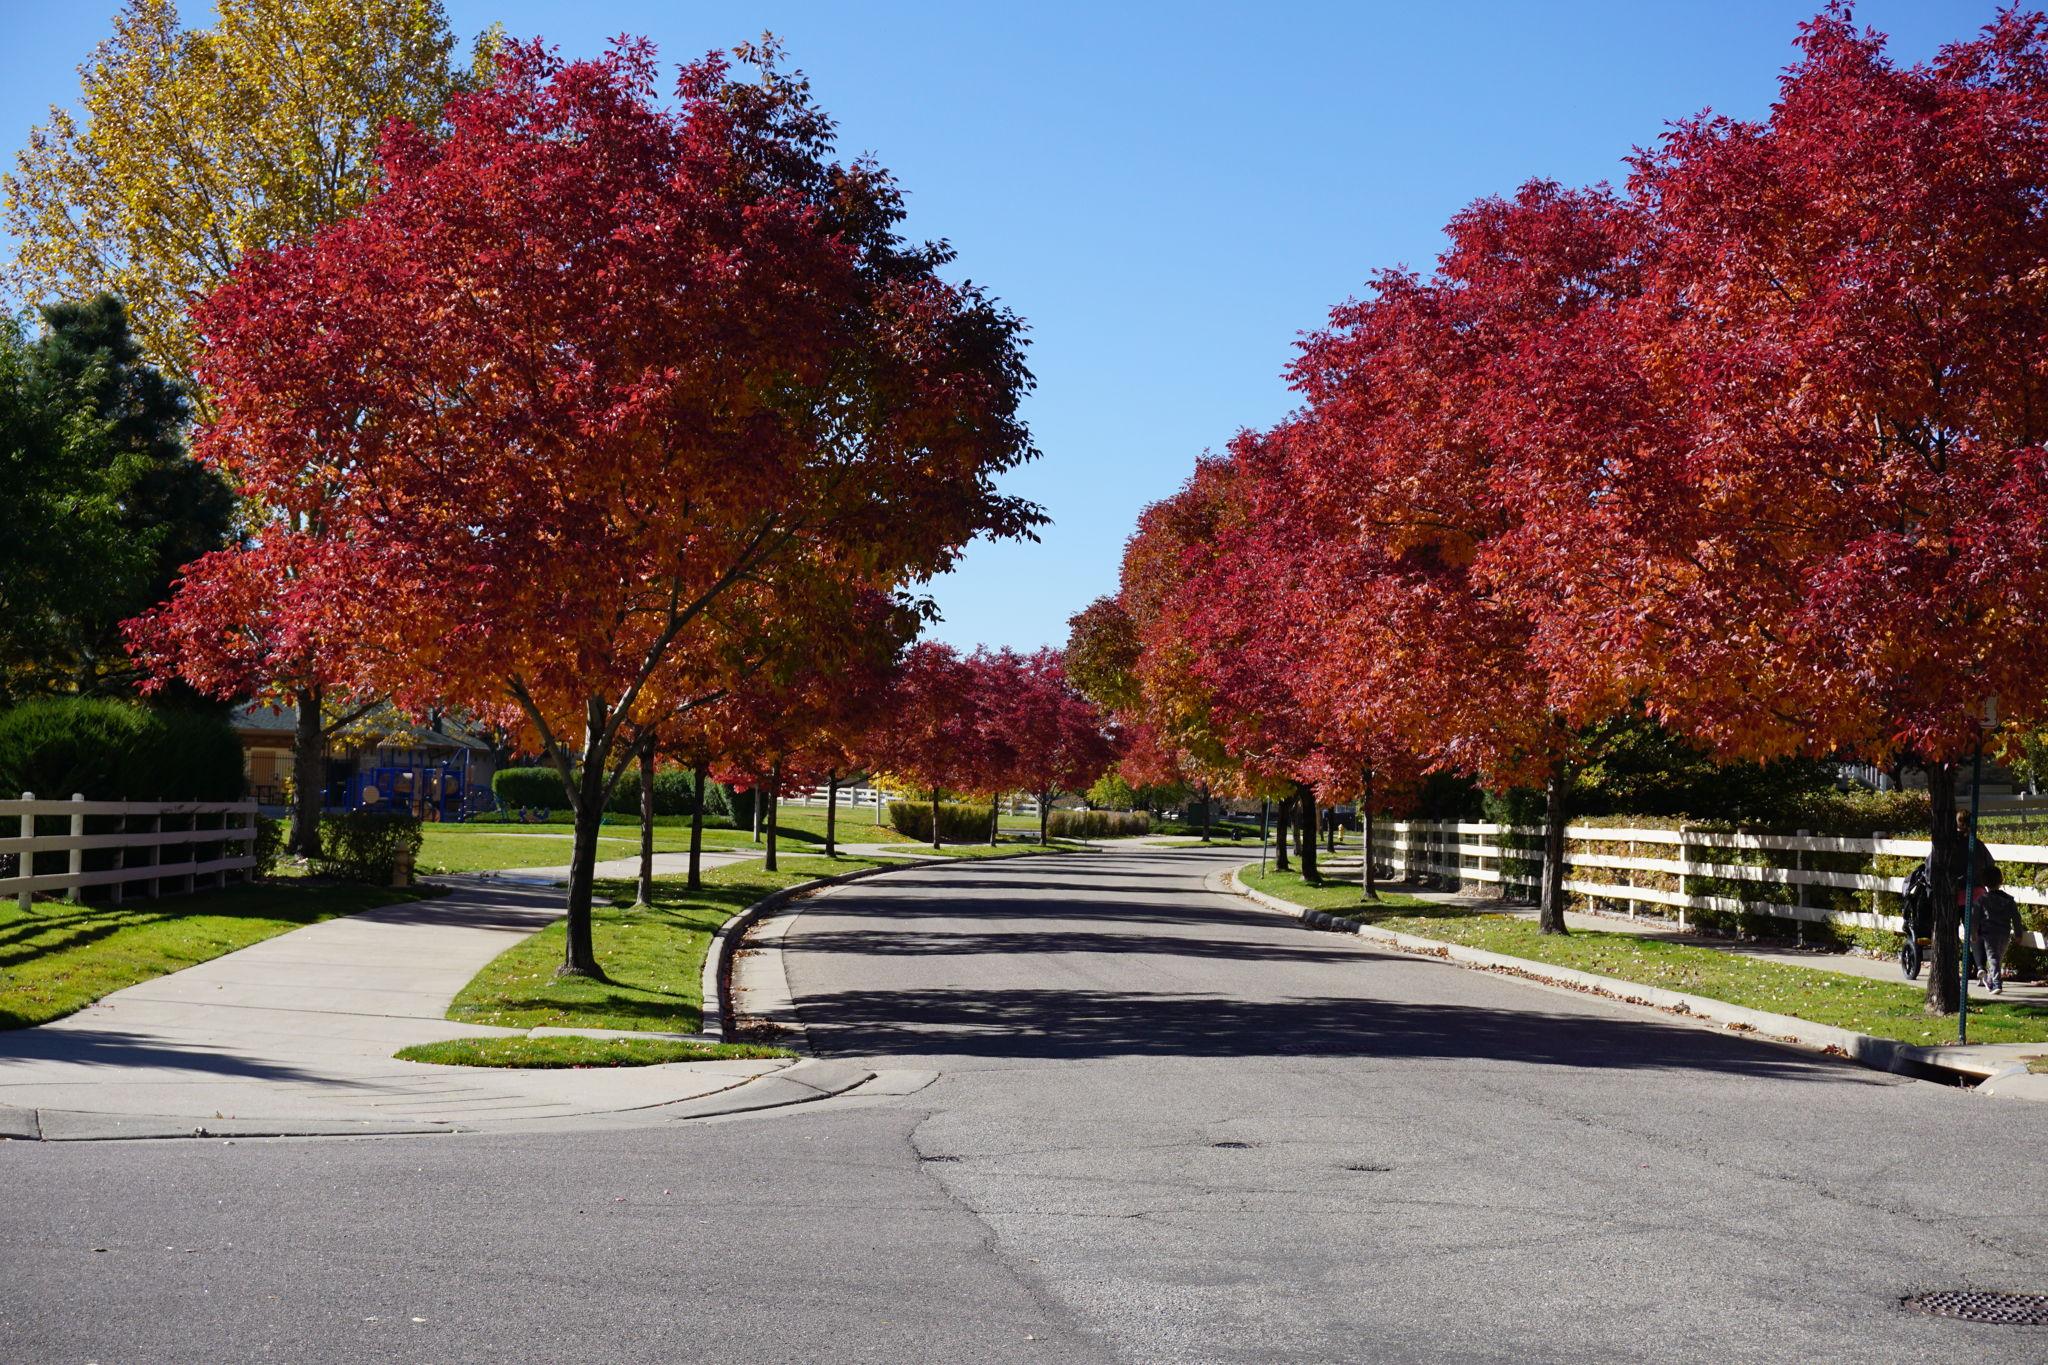 Treelined streets of the Broadlands